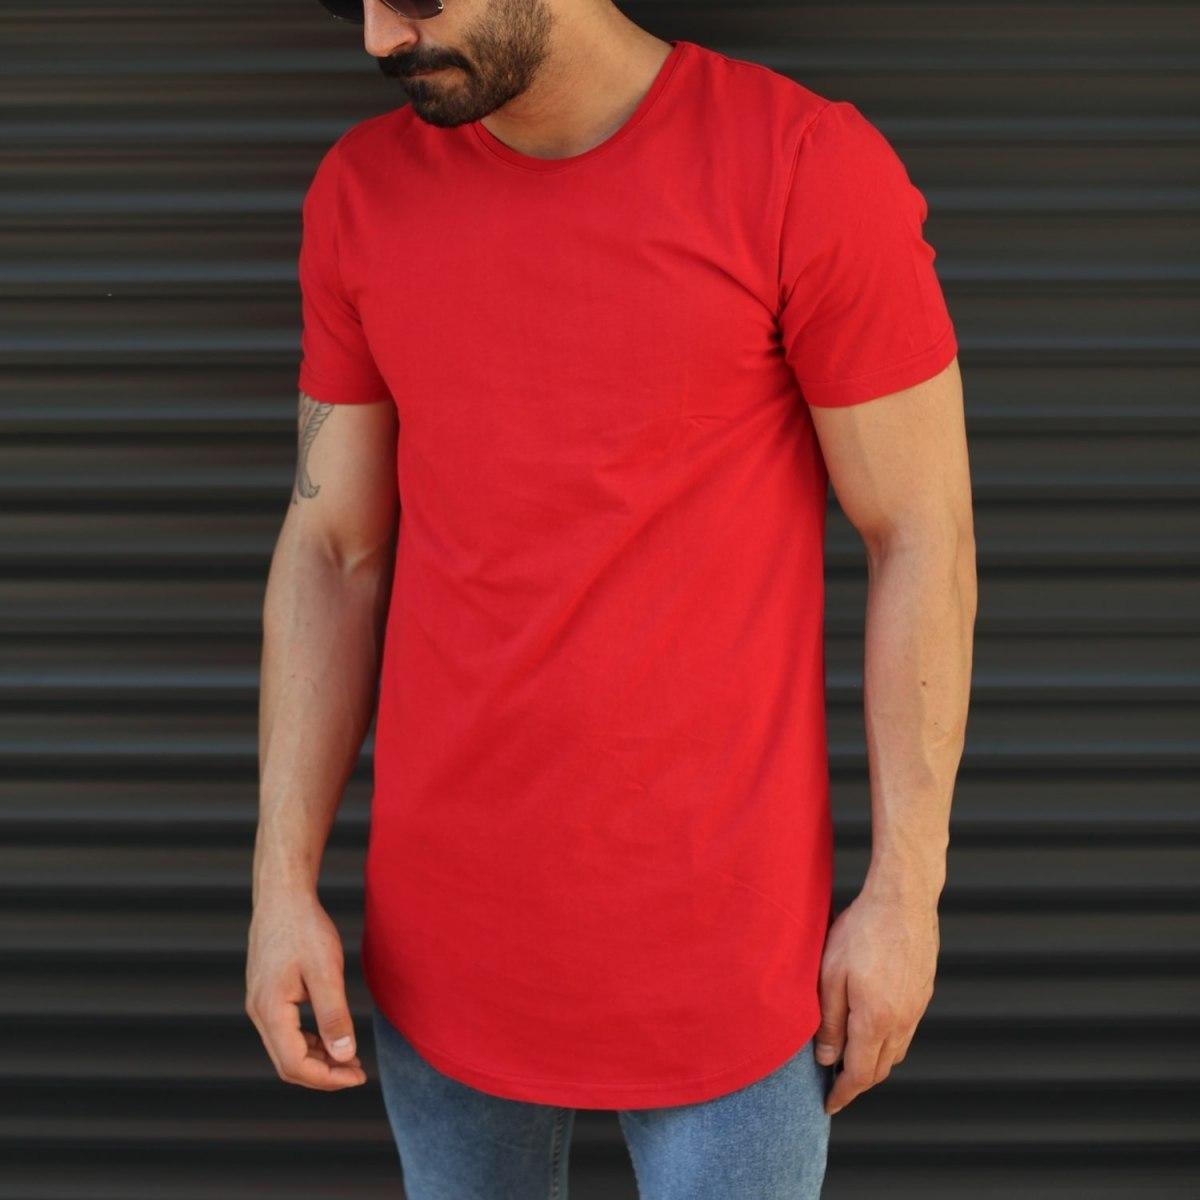 Men's Longline Round Neck T-Shirt In Red Mv Premium Brand - 1